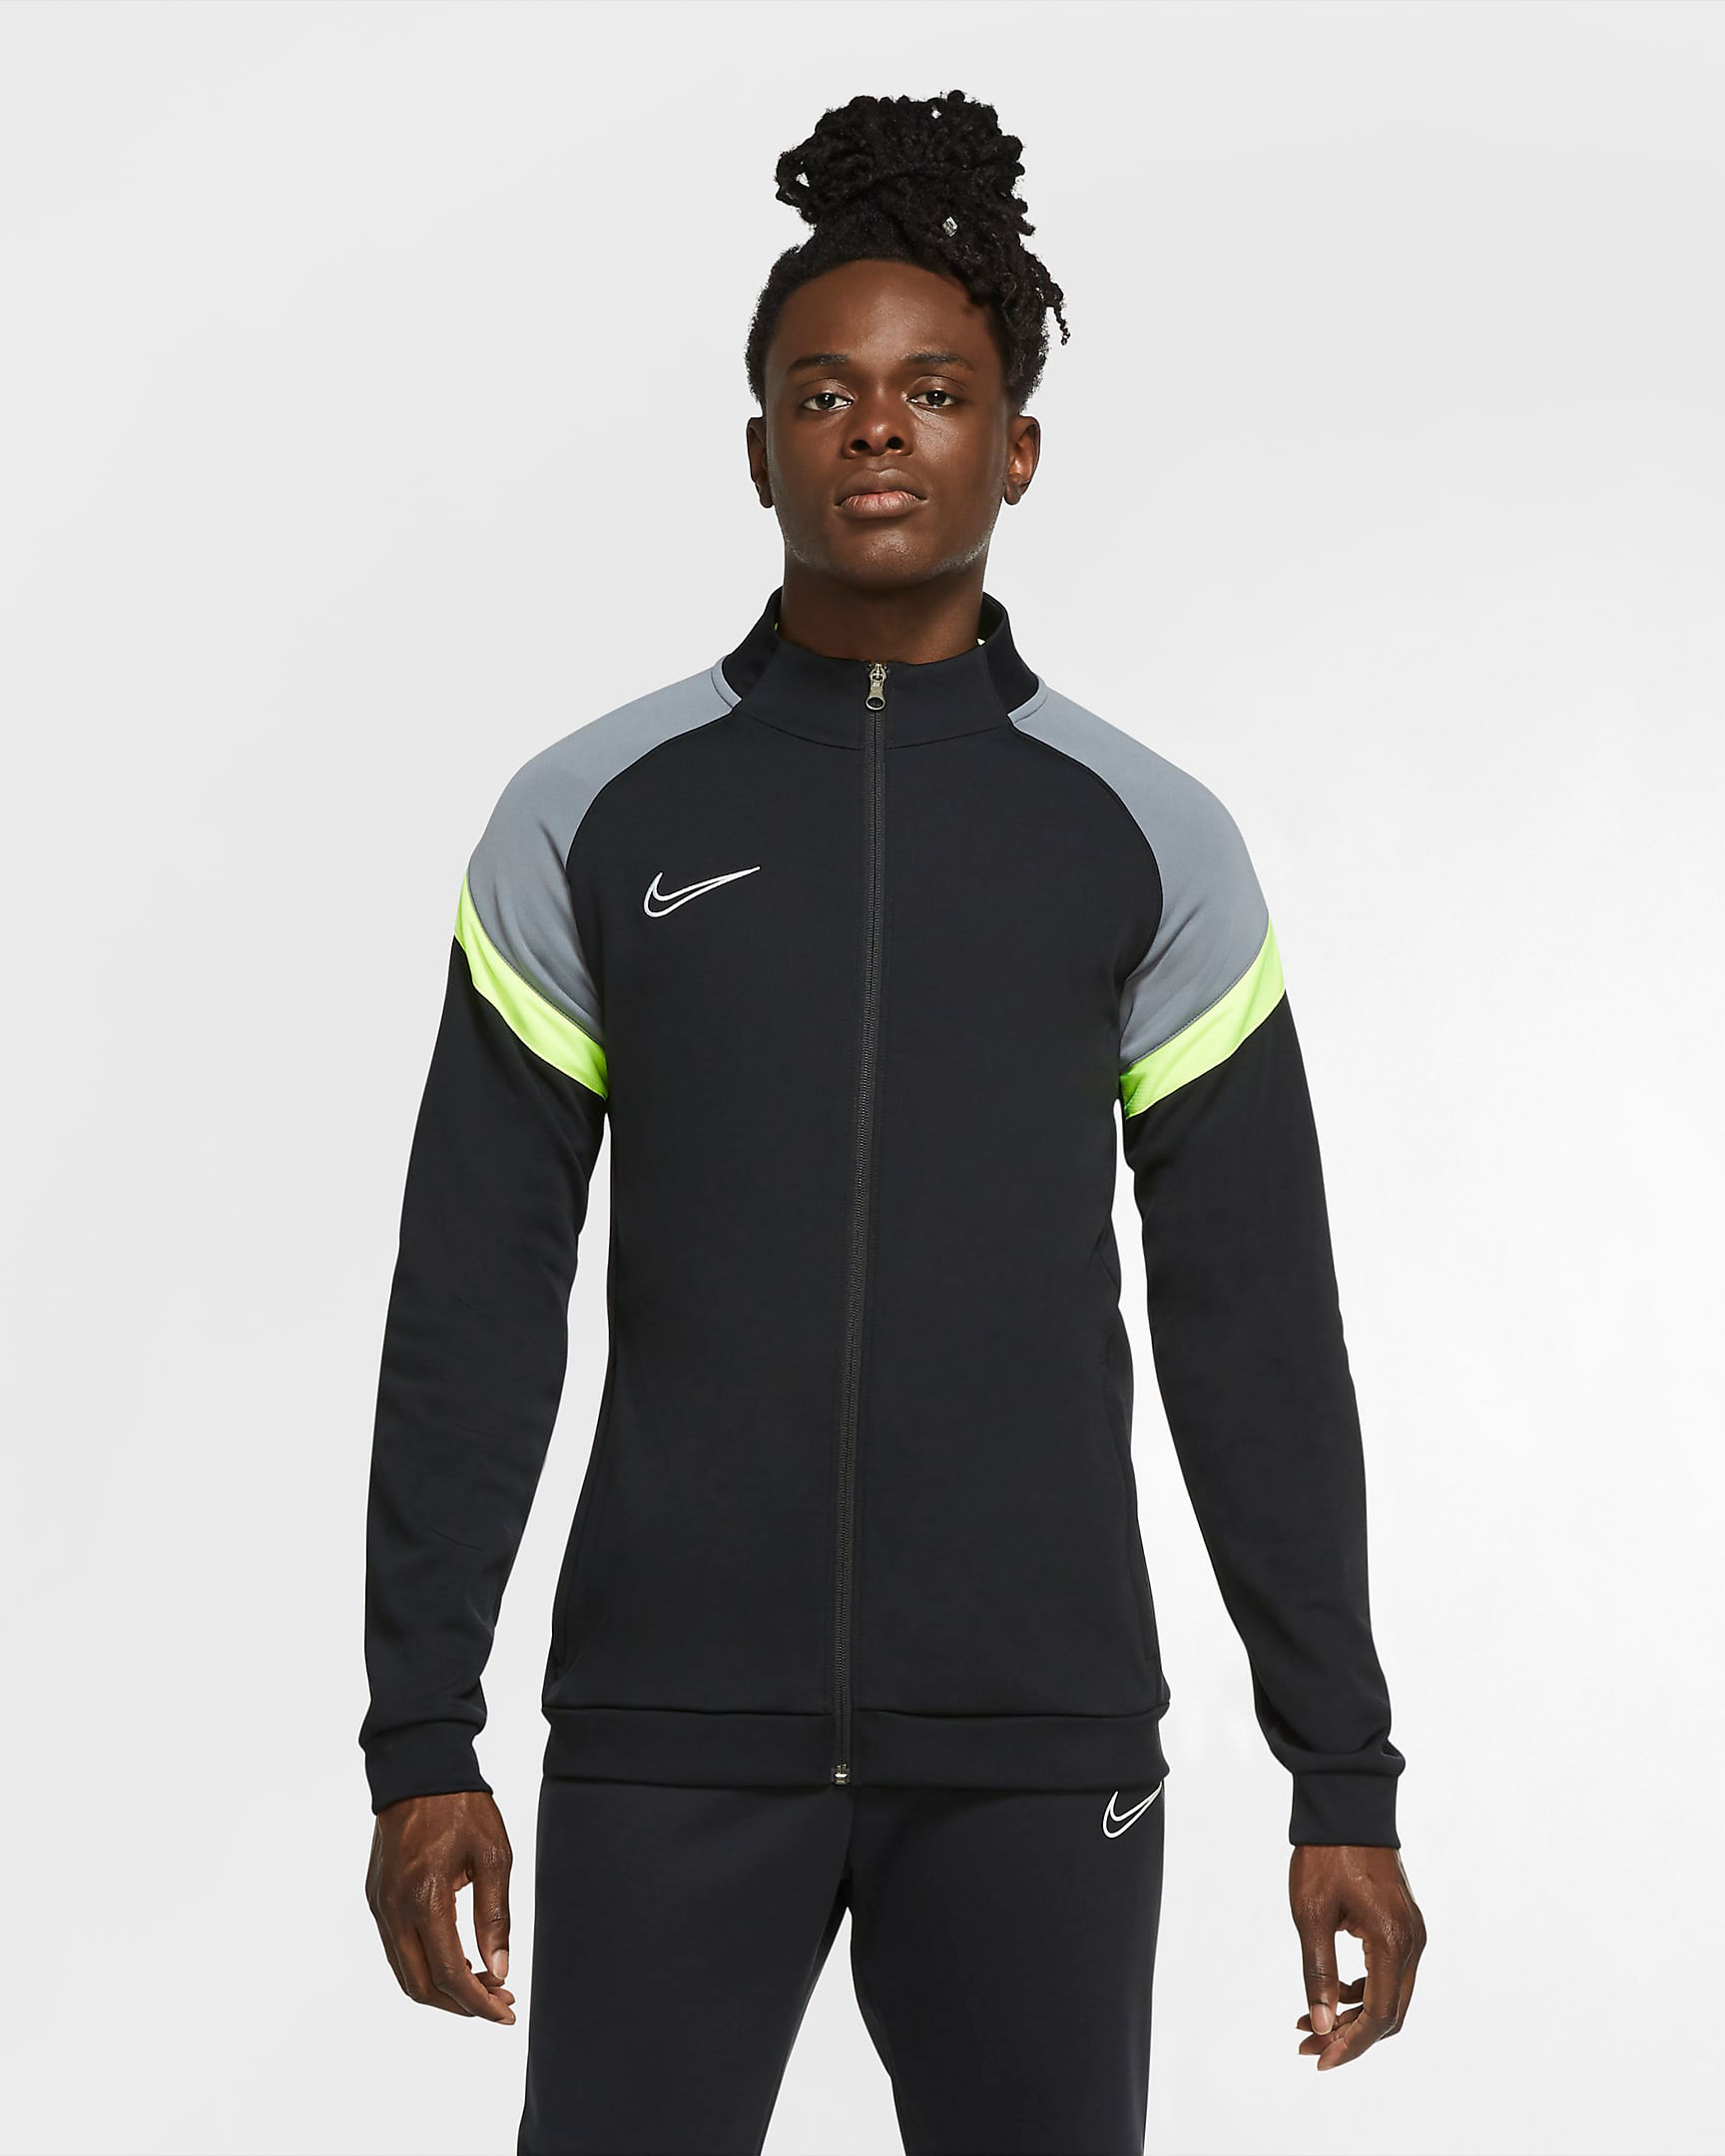 nike-air-max-95-neon-og-2020-track-jacket-2